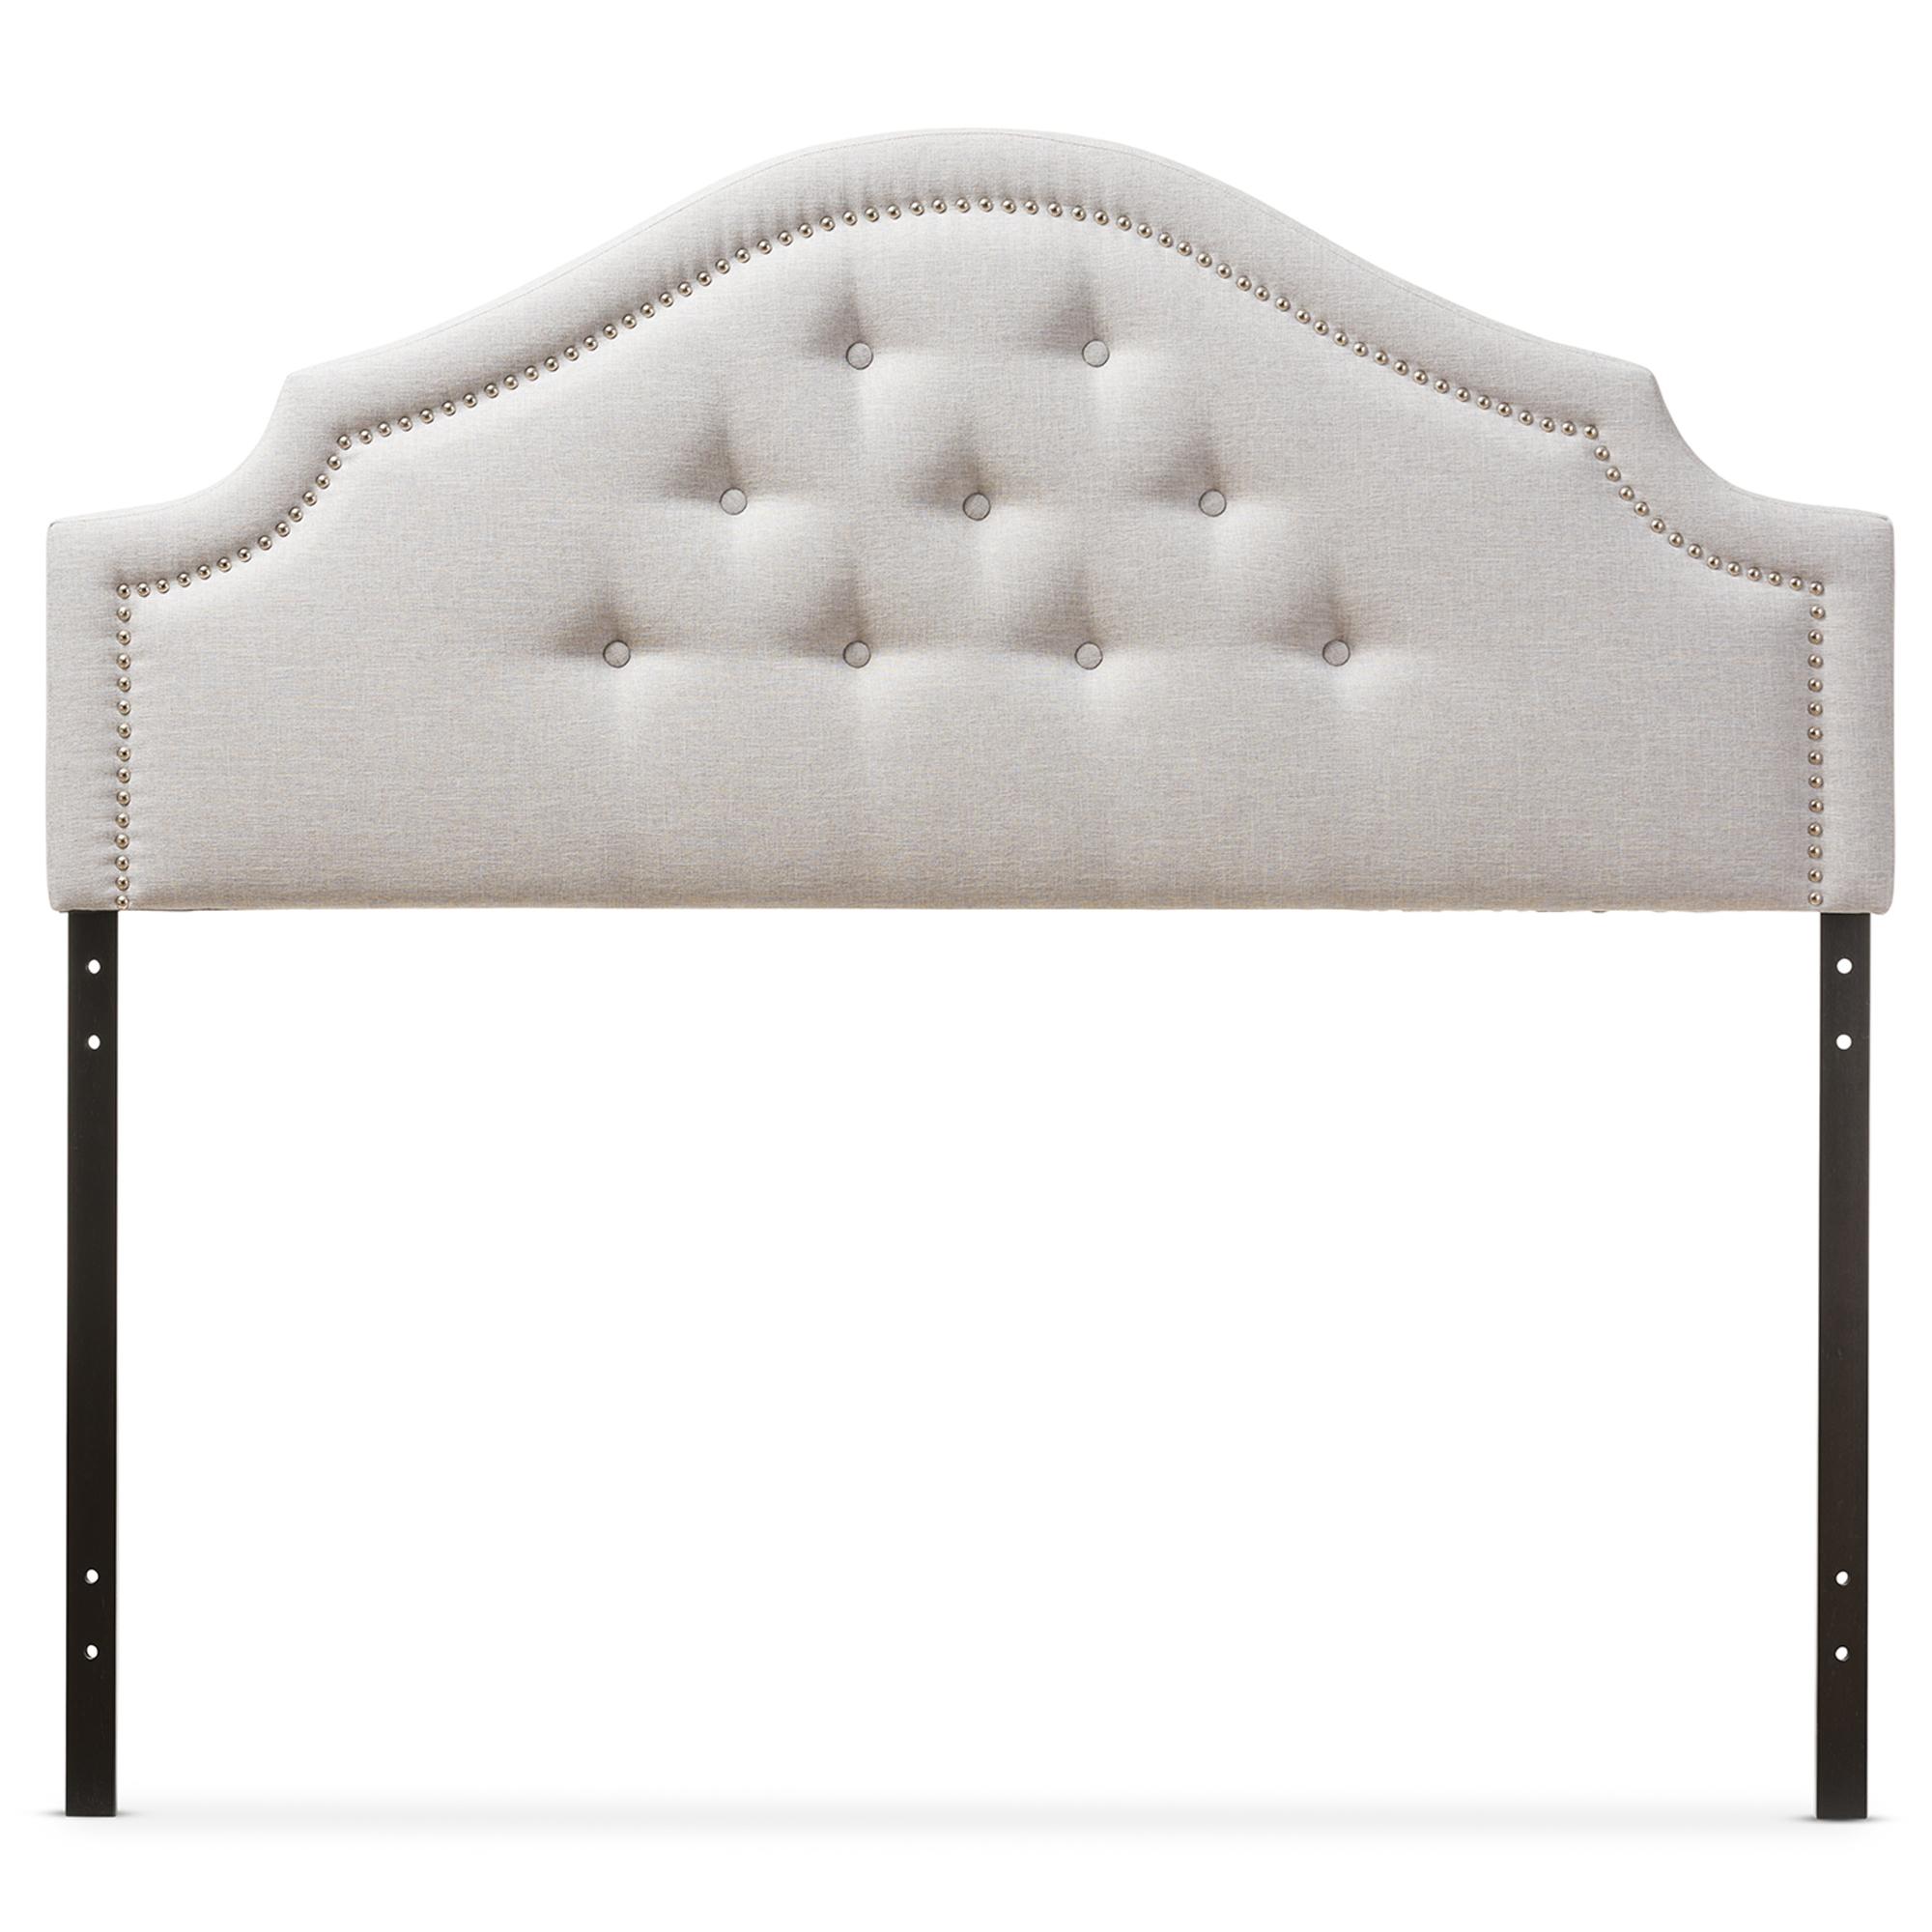 baxton studio cora modern and greyish beige fabric upholstered queen size headboard iebbt6564